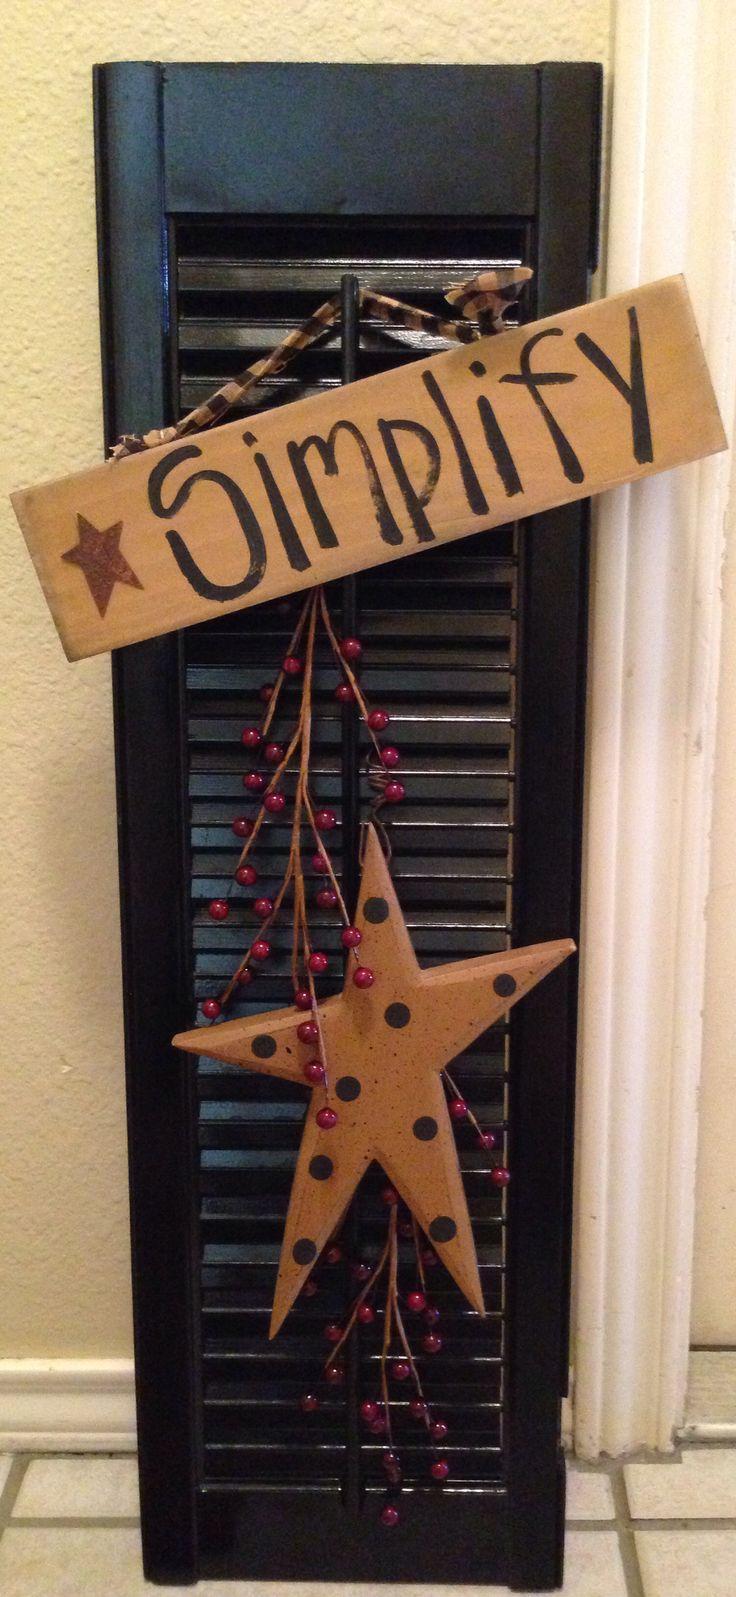 Easy to make primitive home decor | My Wishlist | Pinterest ...